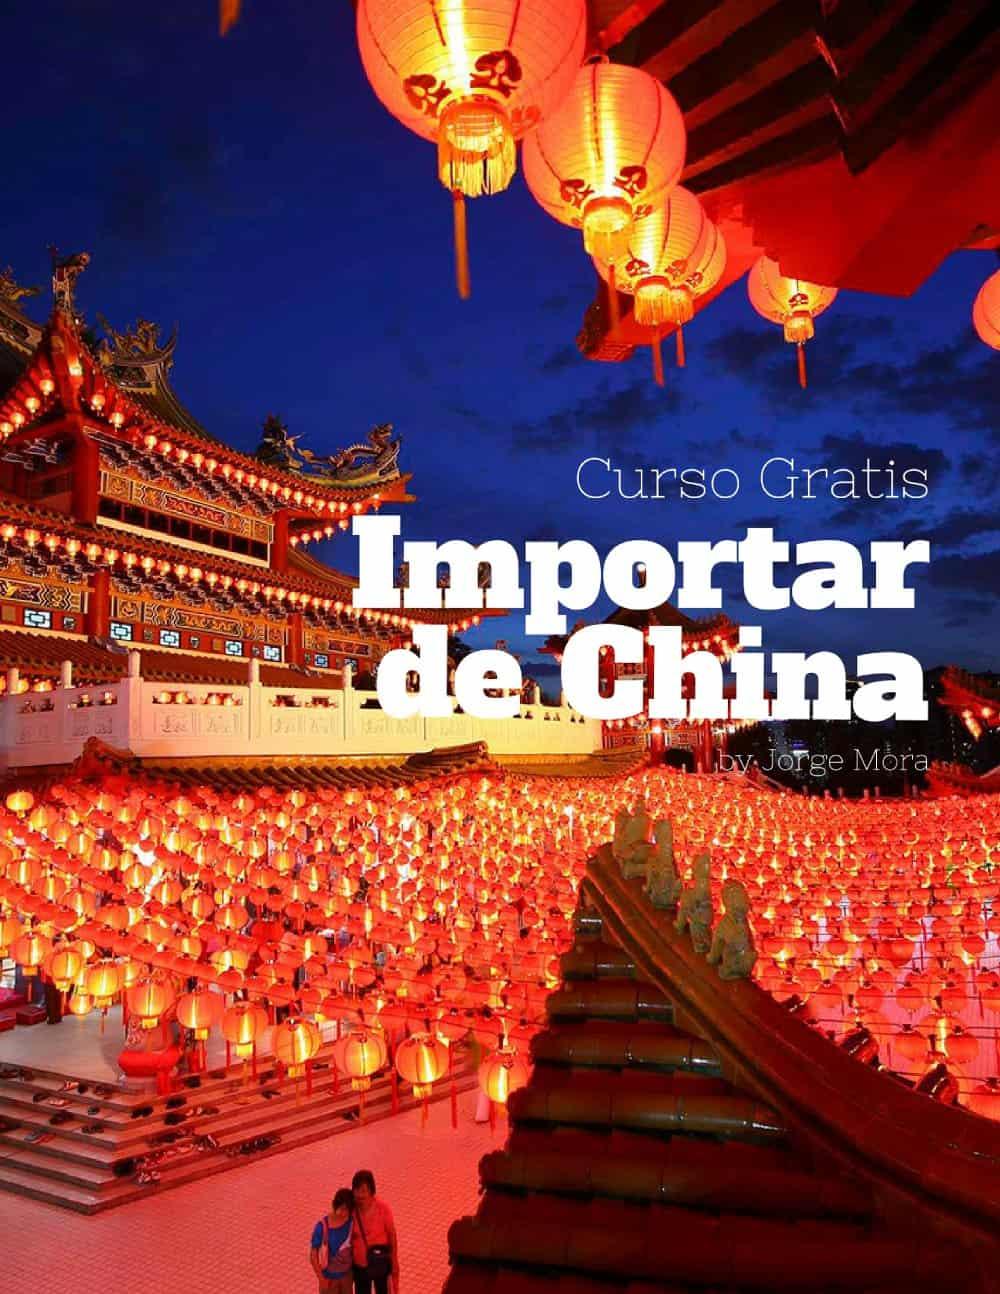 Curso Gratis Importar de China